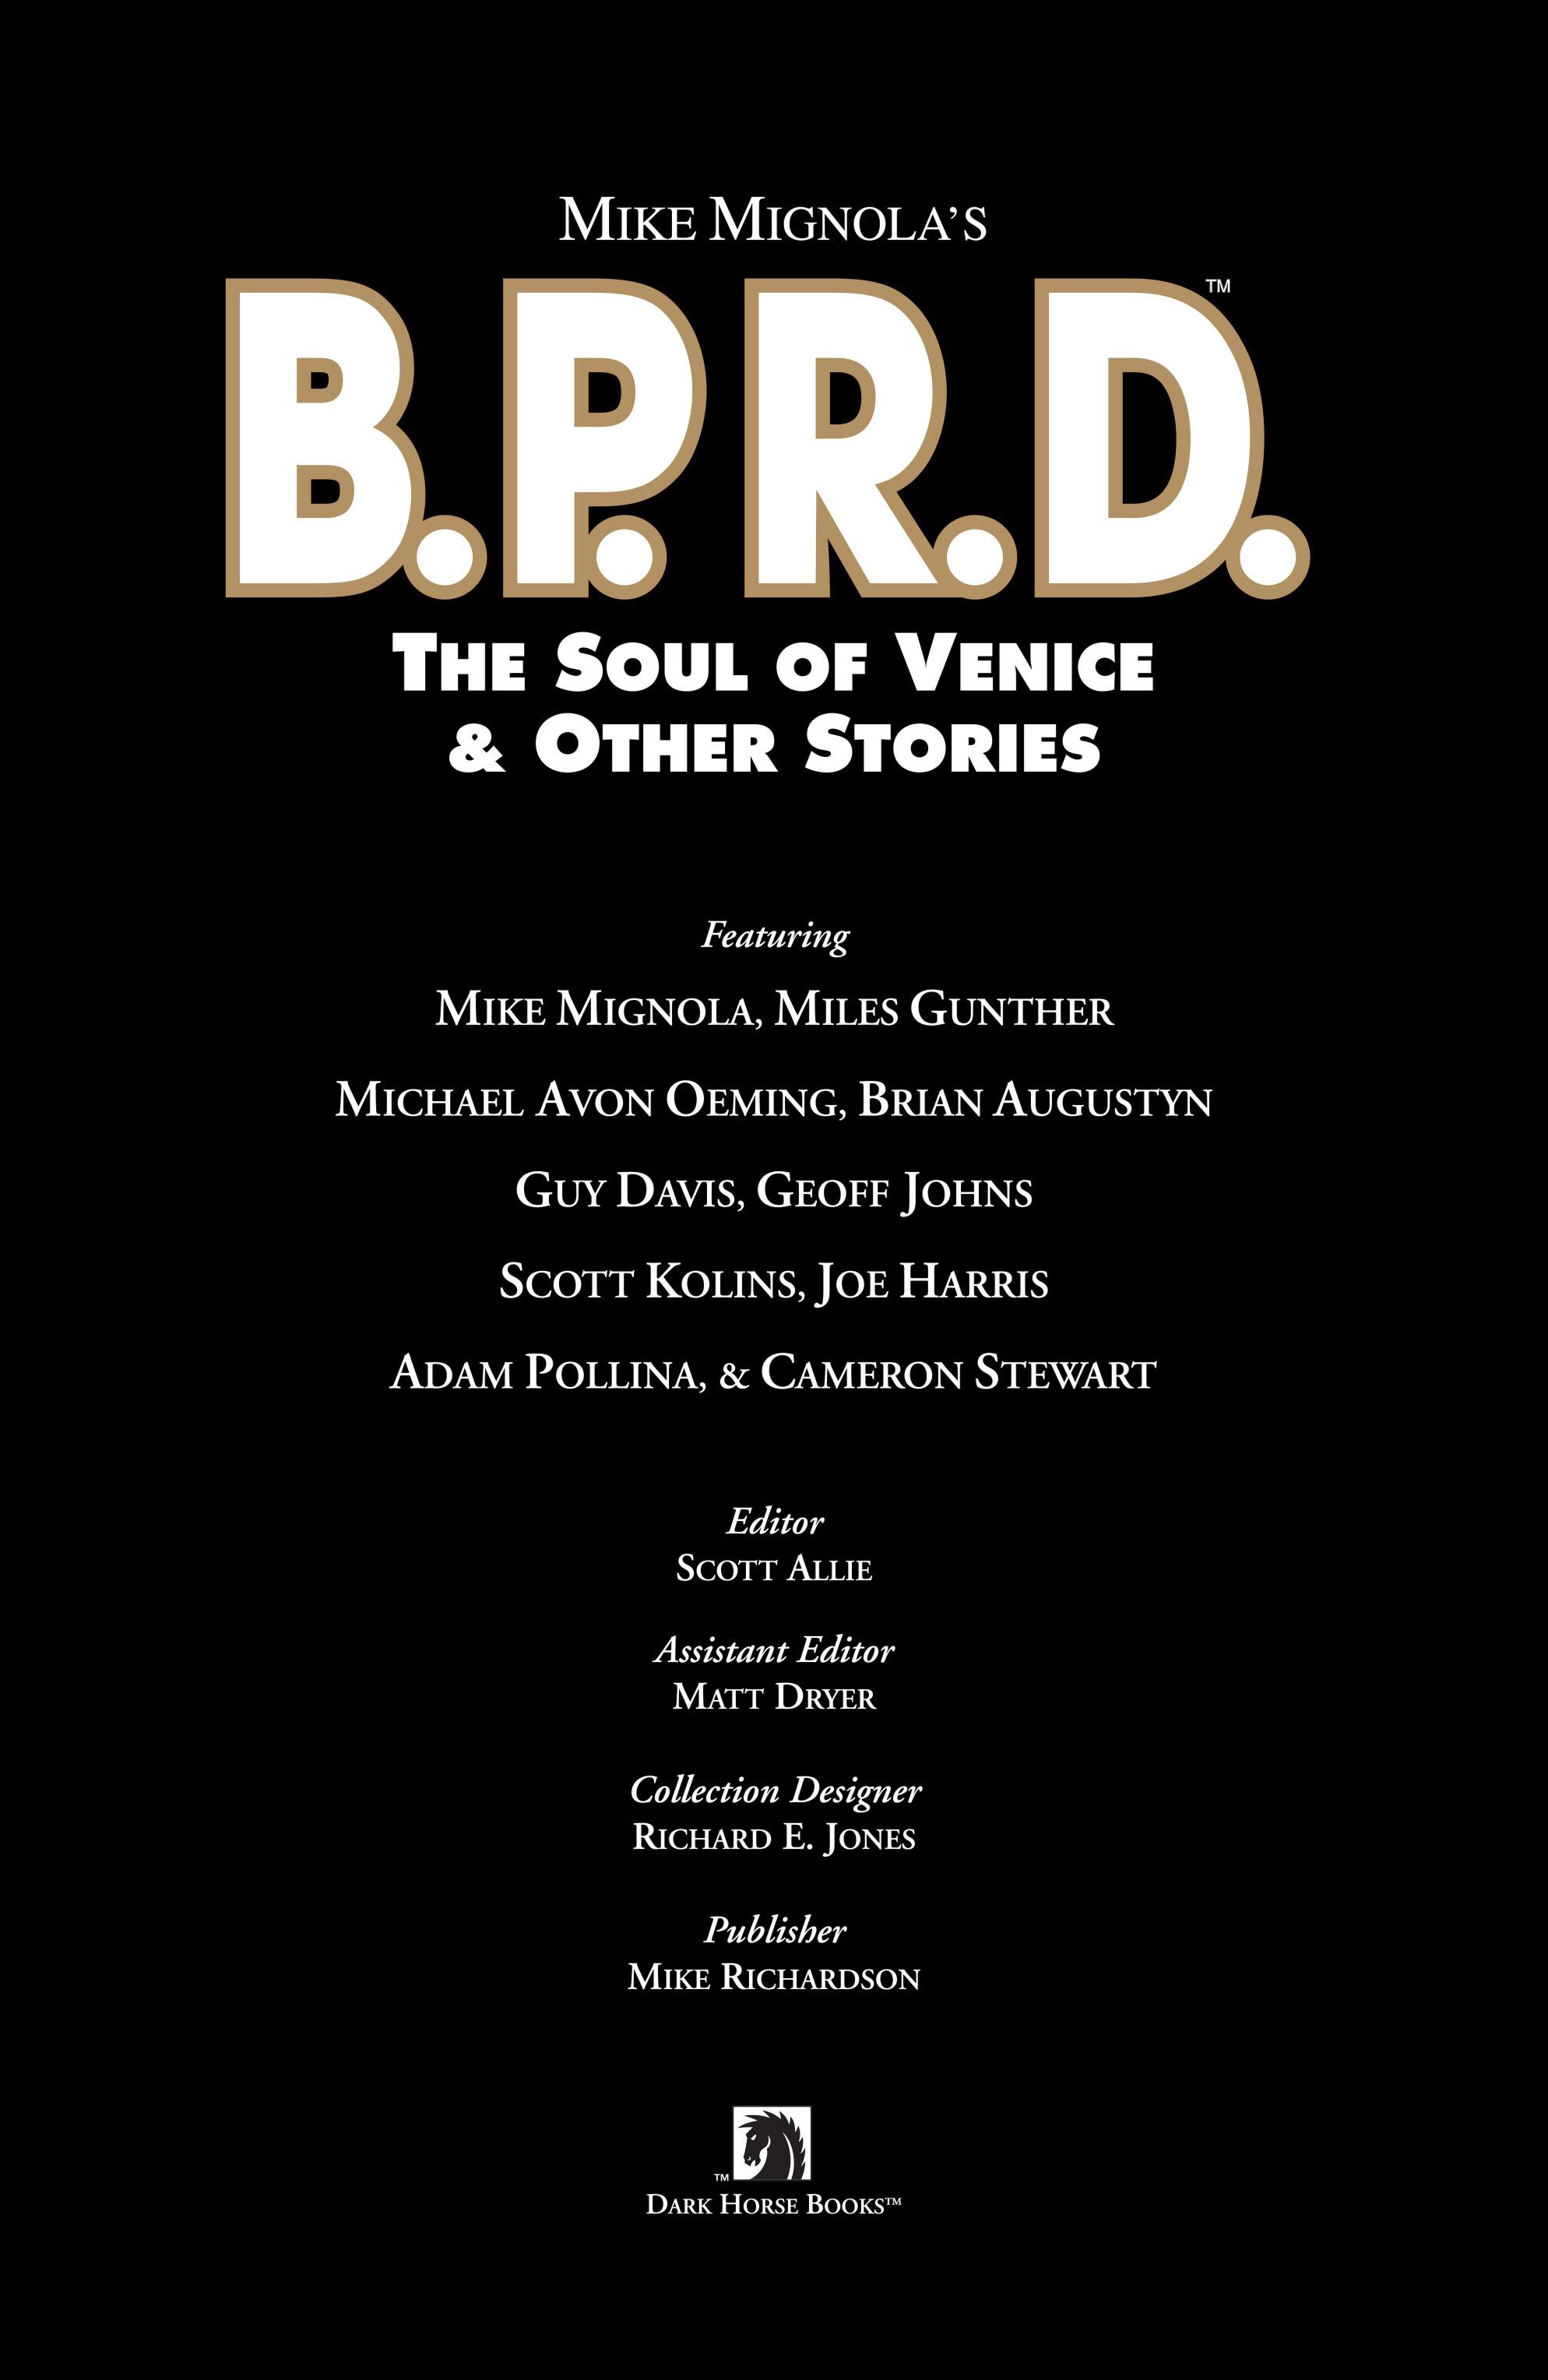 Read online B.P.R.D. (2003) comic -  Issue # TPB 2 - 4